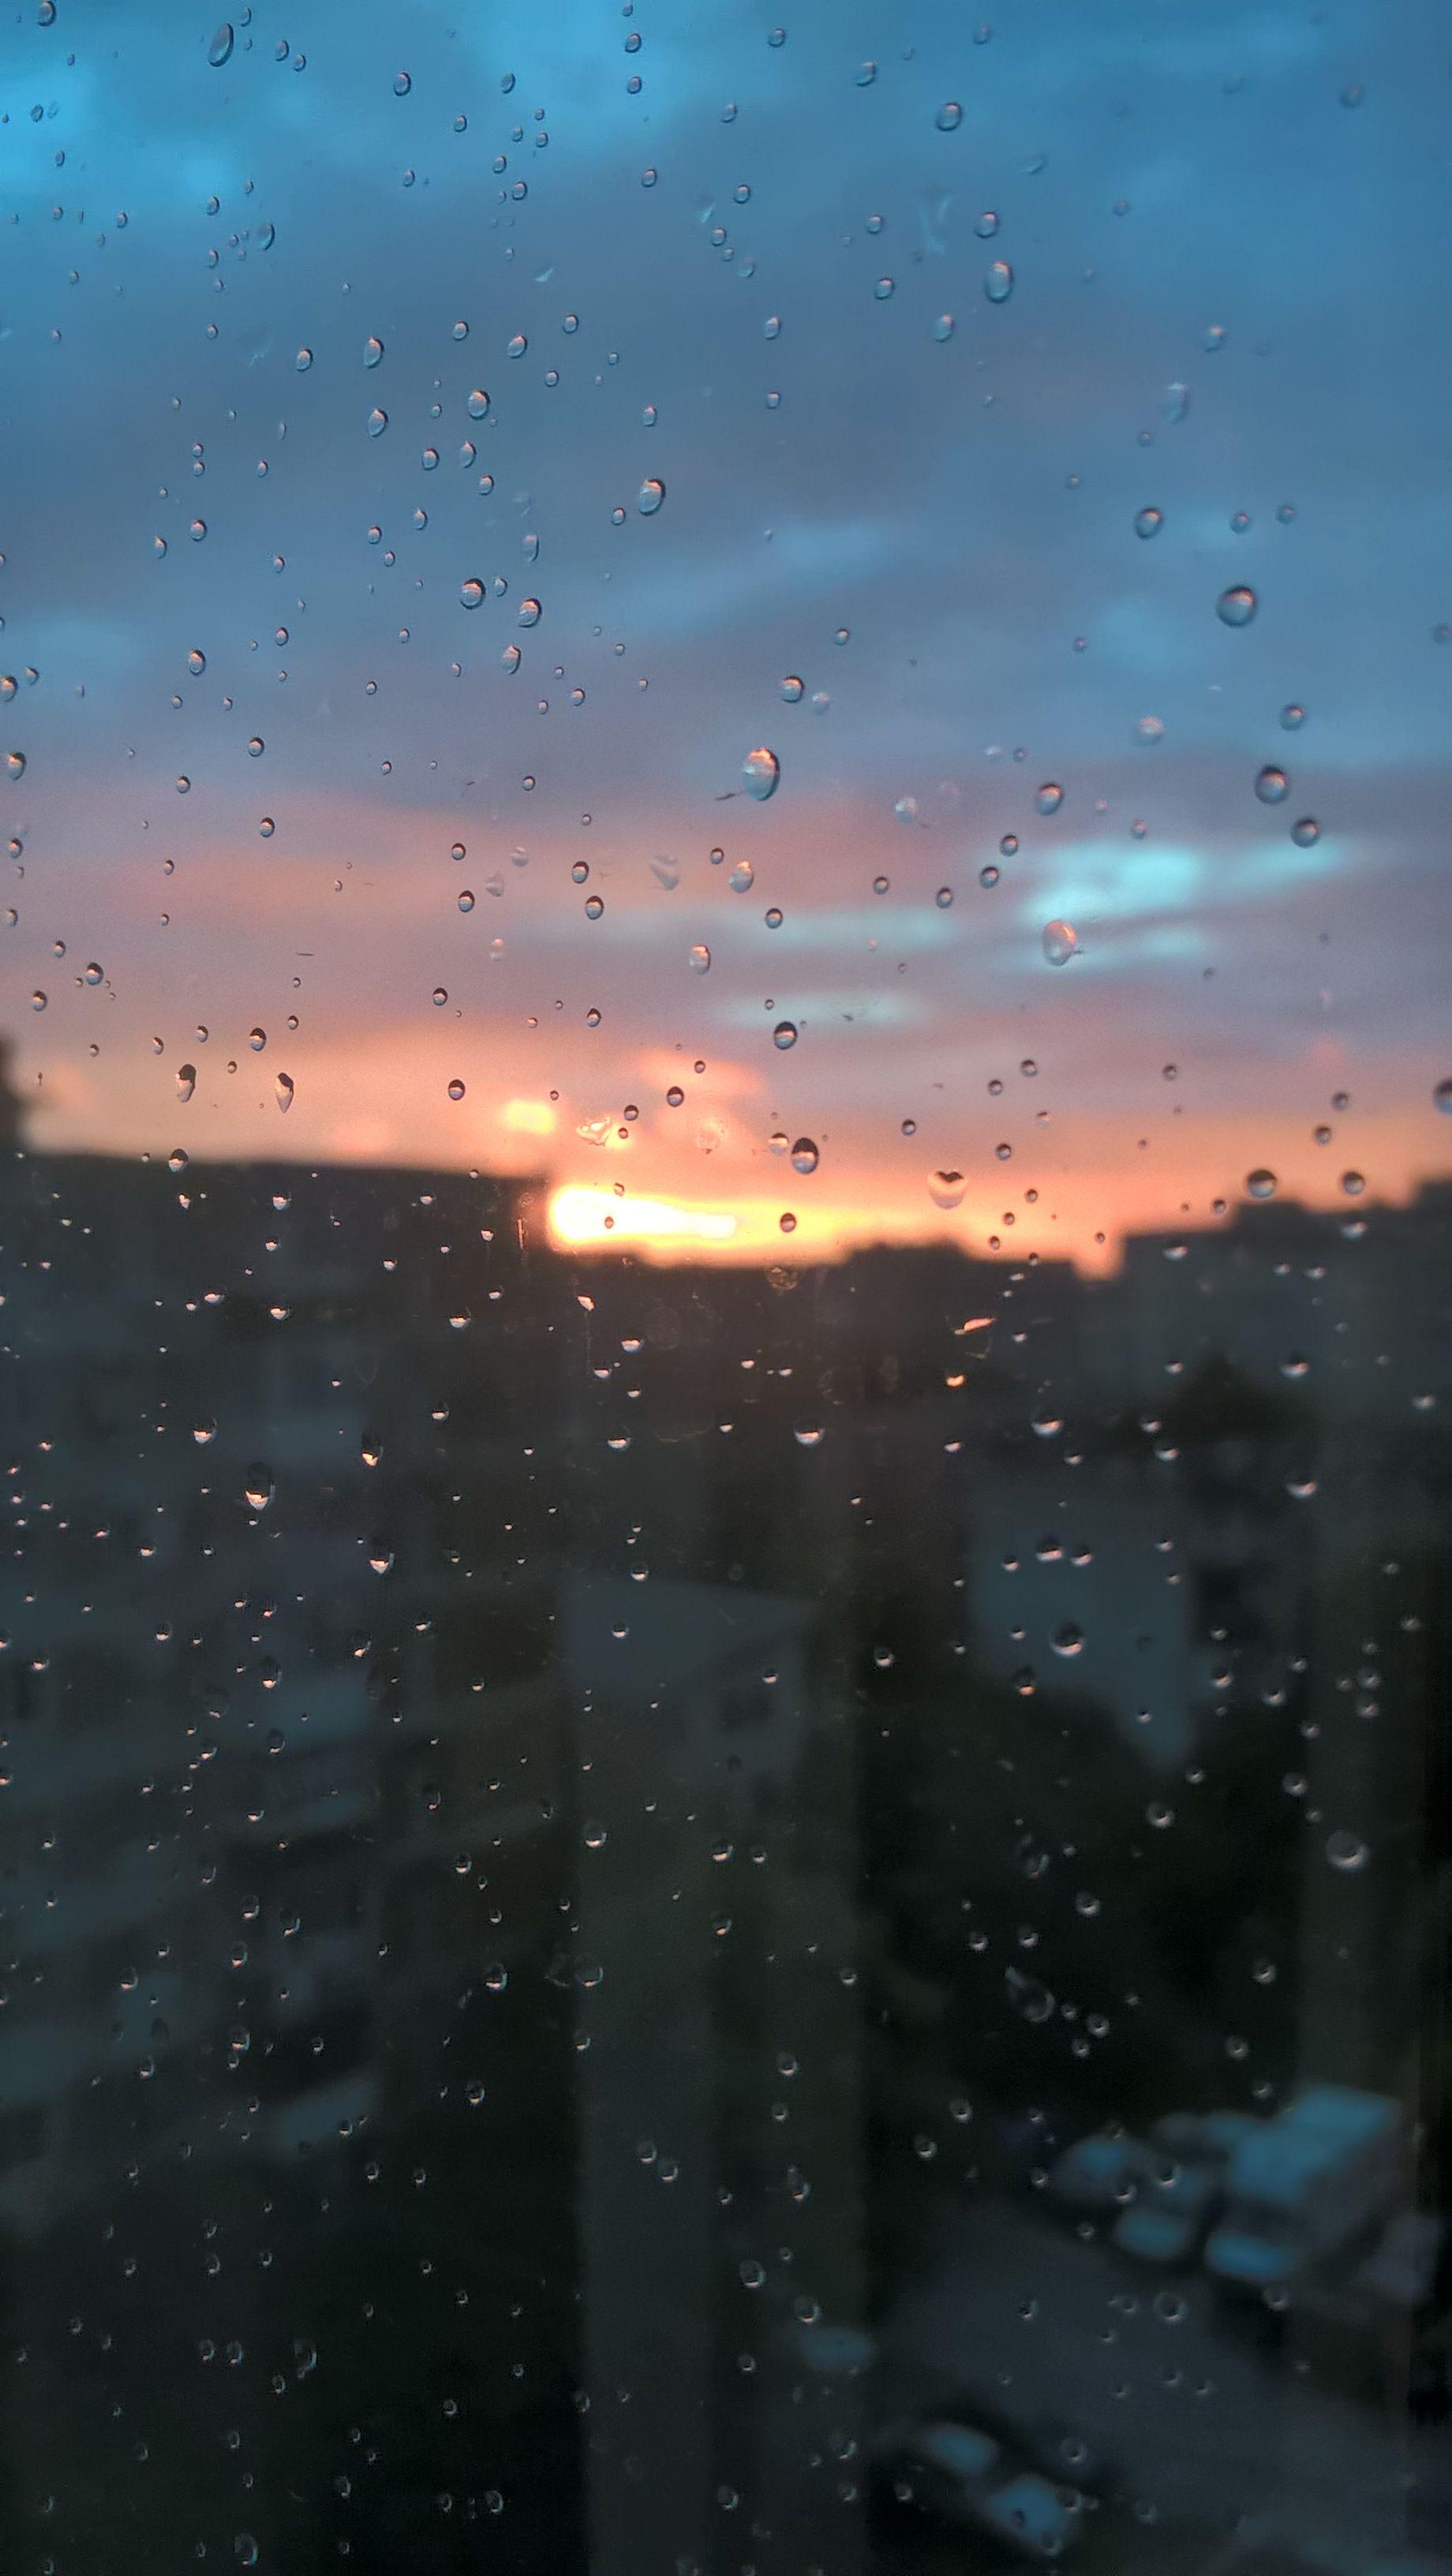 Drops Sunset Rain Photography Aesthetic Wallpapers Love Rain